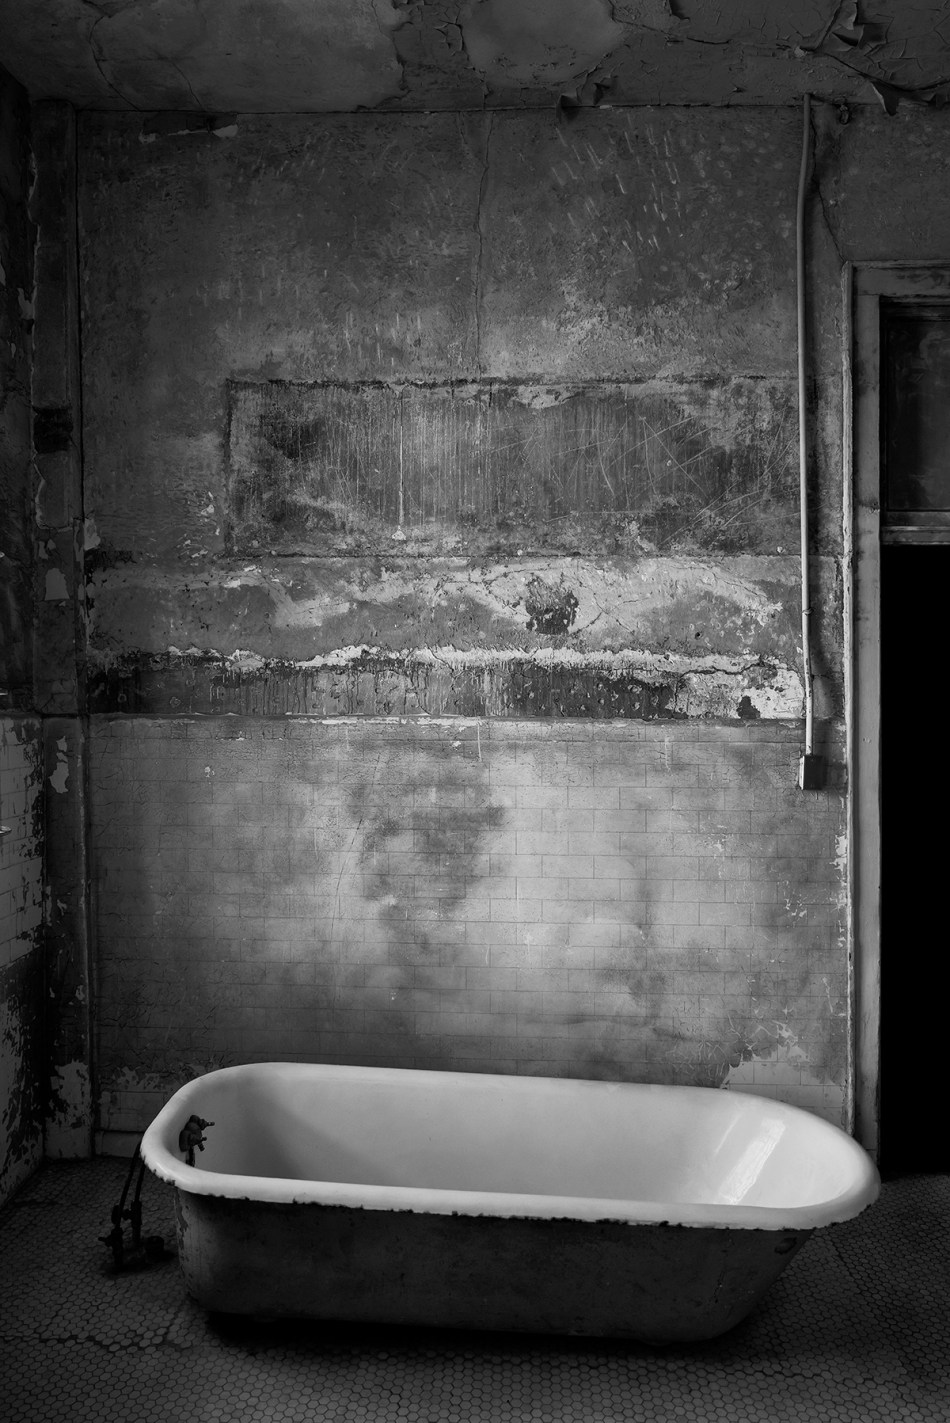 black and white image of a bath in the hydro-therapy room of Alcatraz Prison